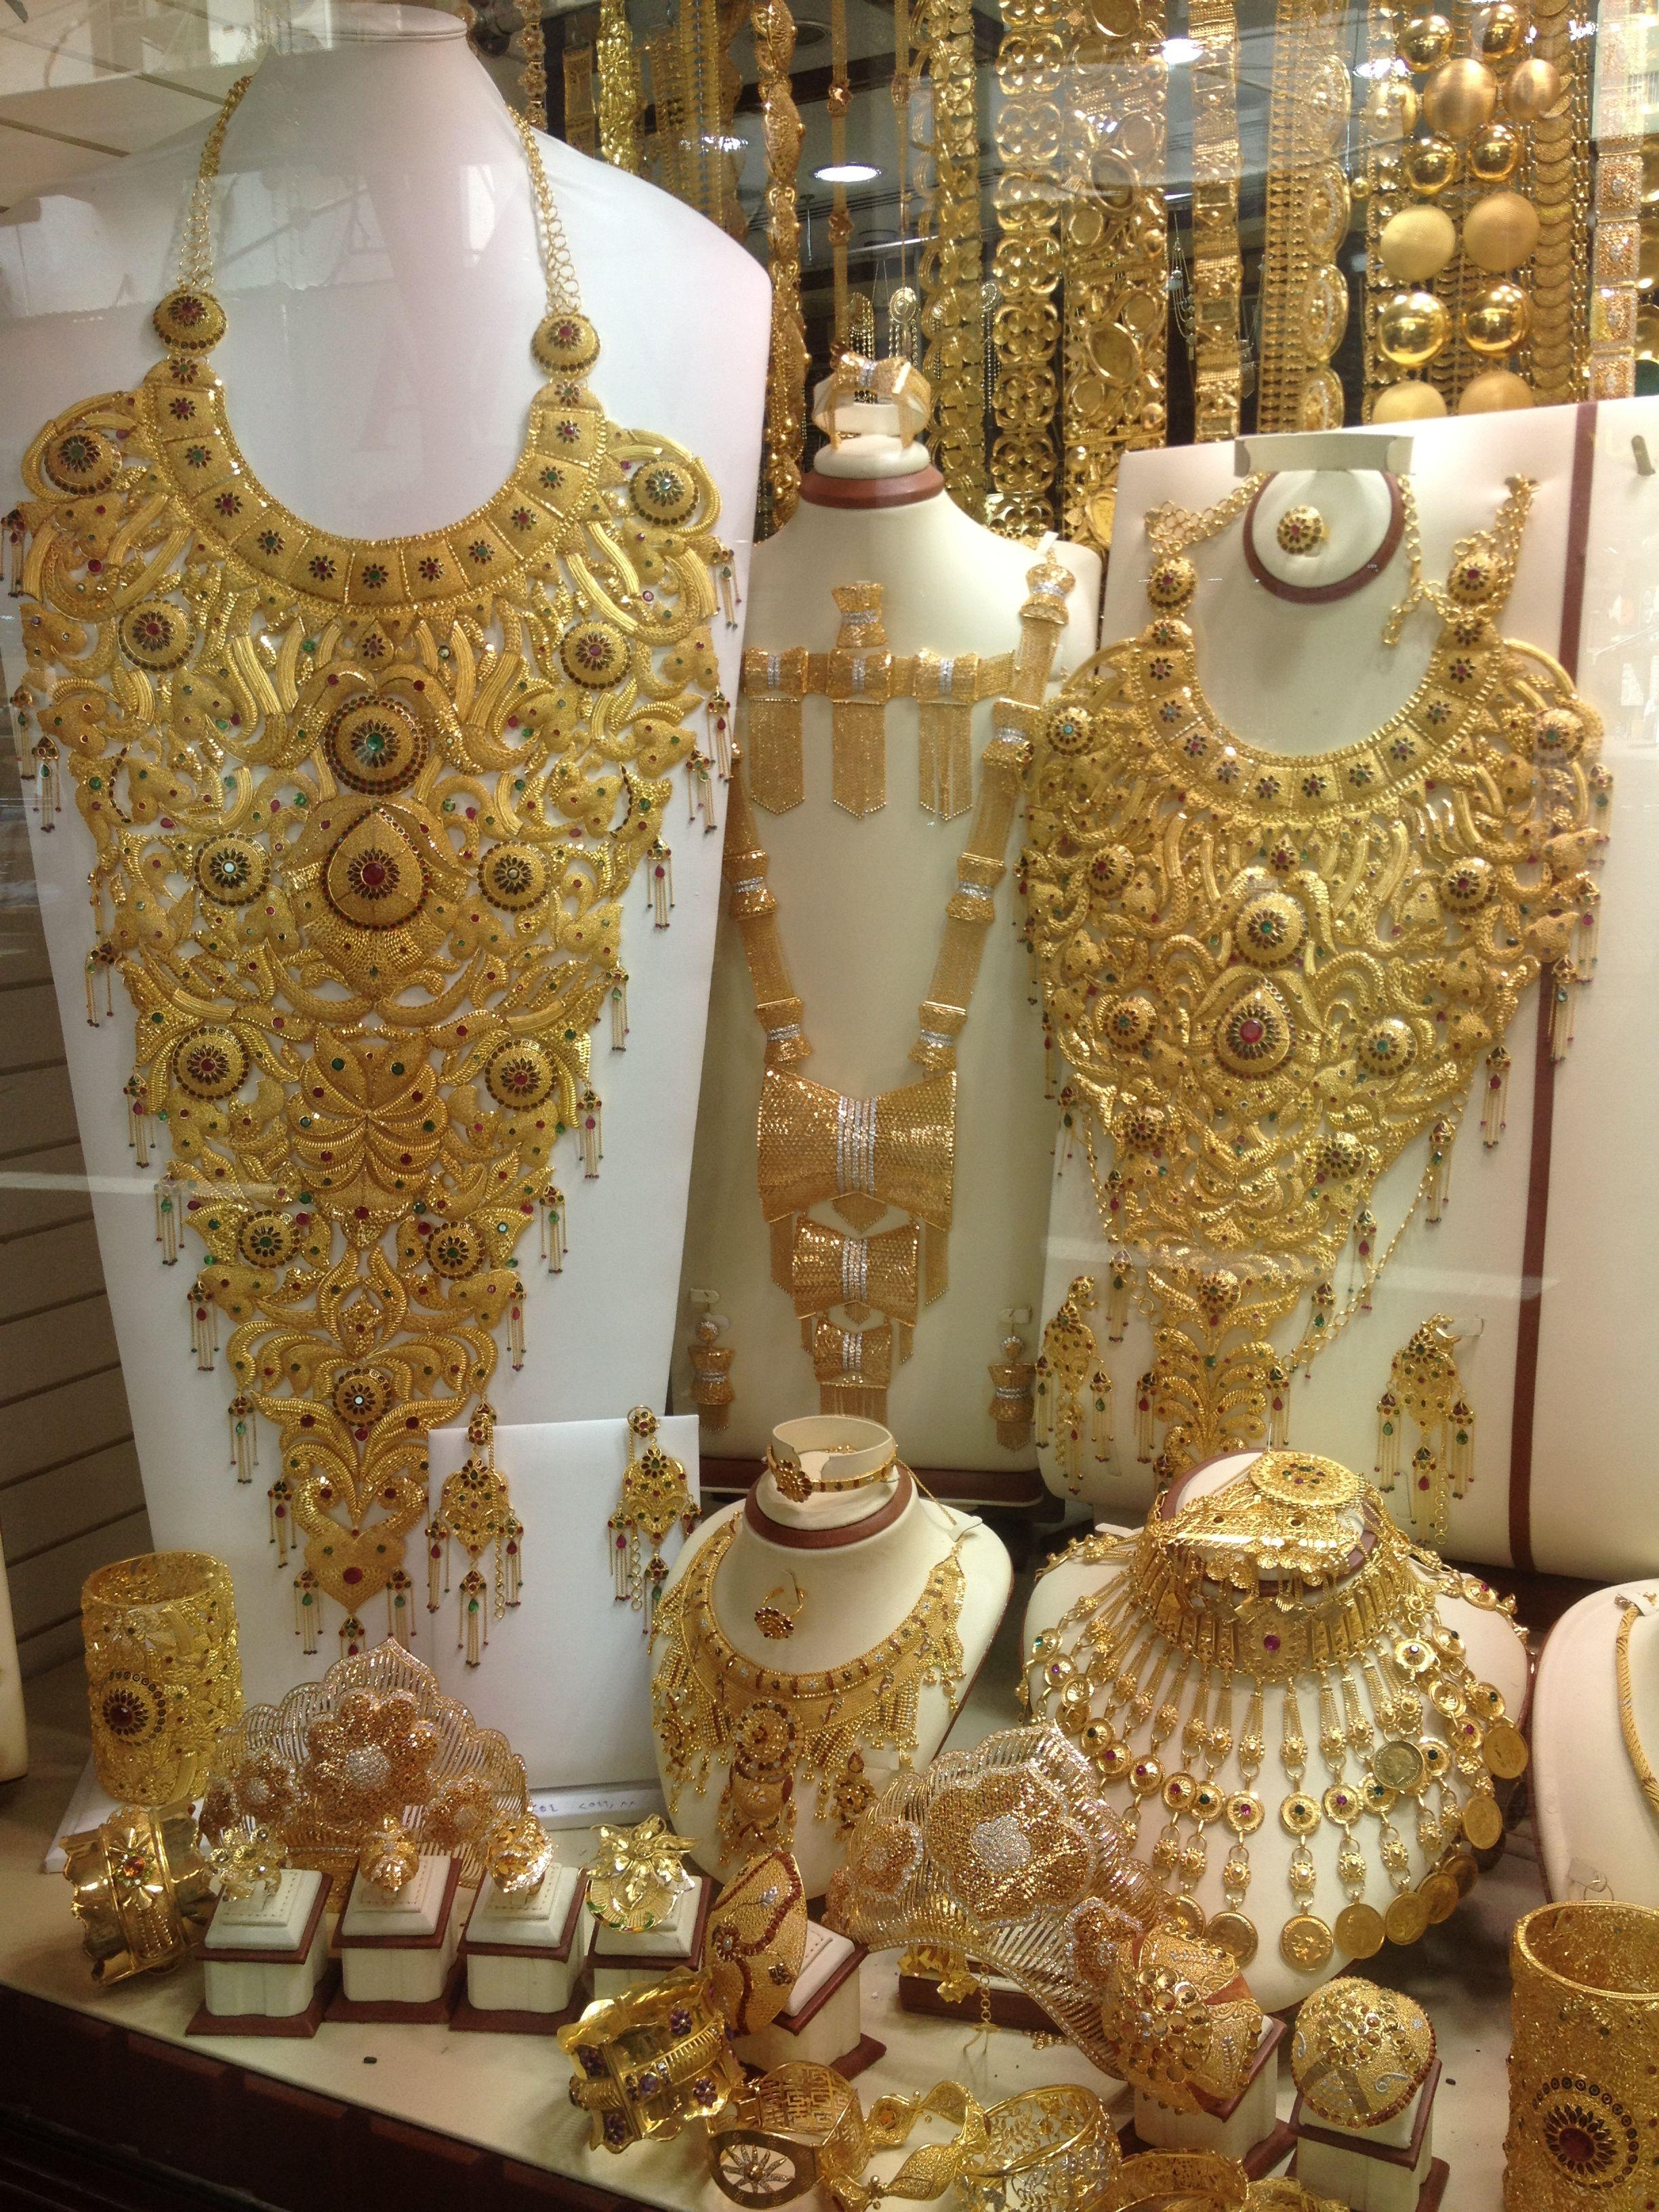 Gold Souk Dubai Street Shopping Dubai Gold Jewelry Gold Souk Dubai Gold Souk